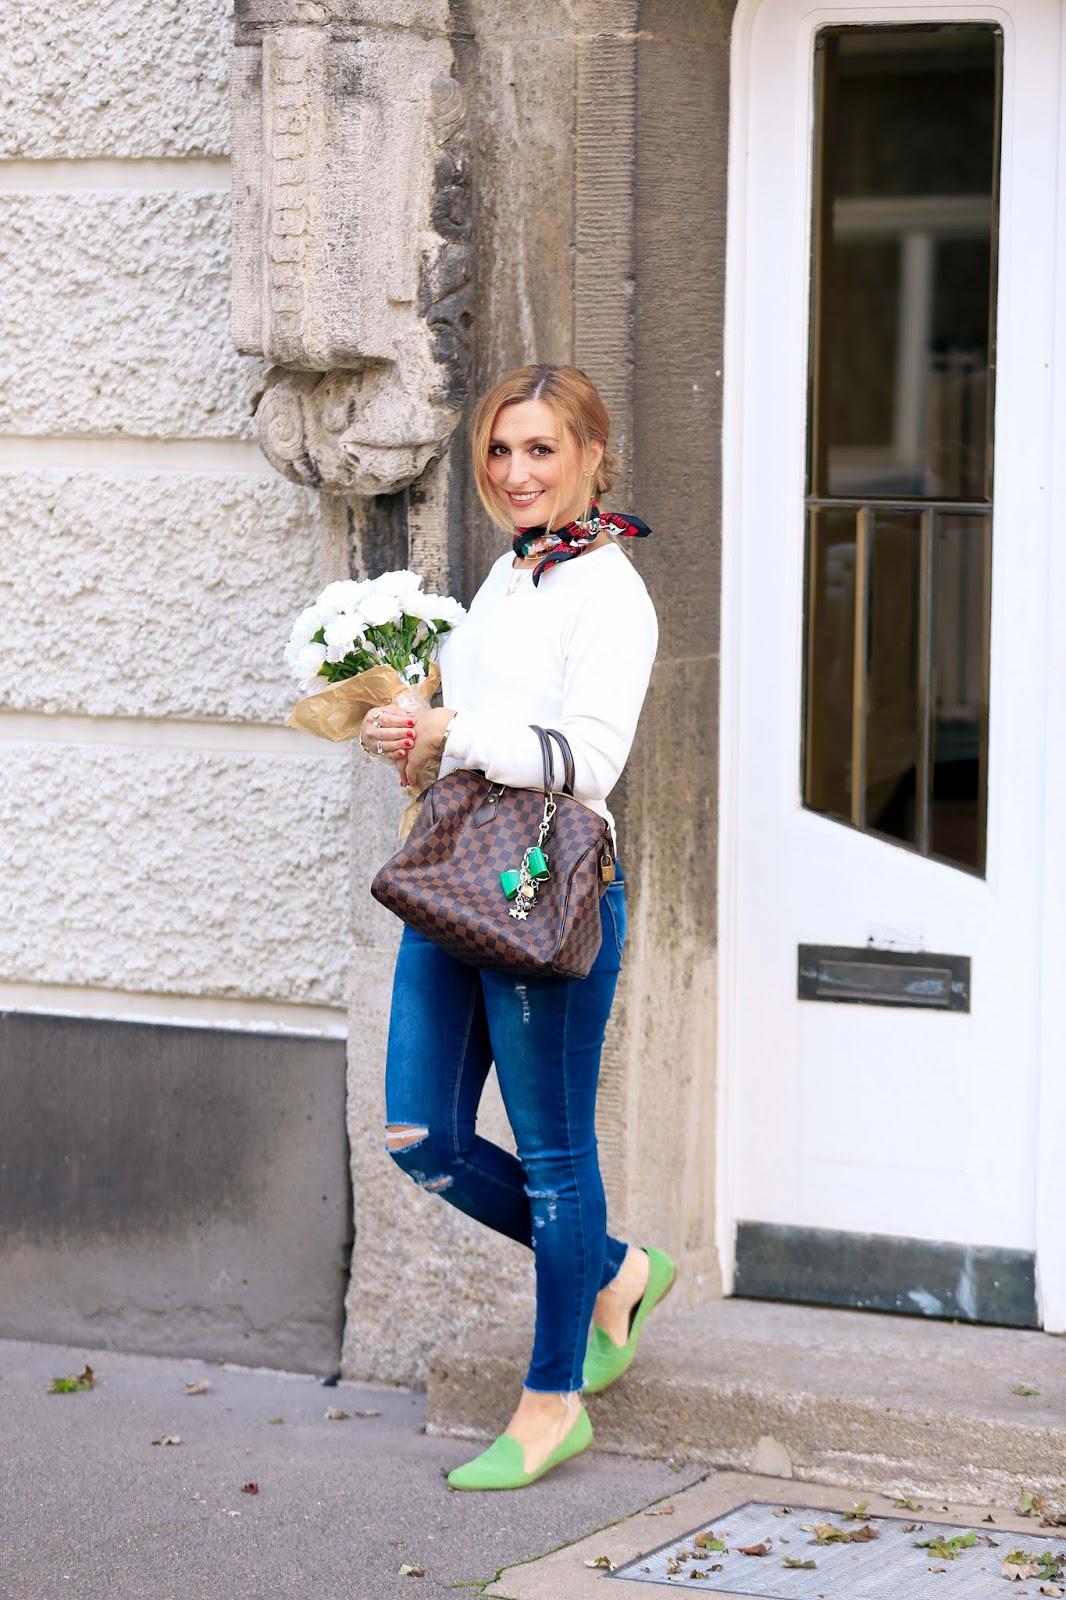 Olivia-palermo-style-blogger-style-deutsche-fashionblogger-lifestyleblogger